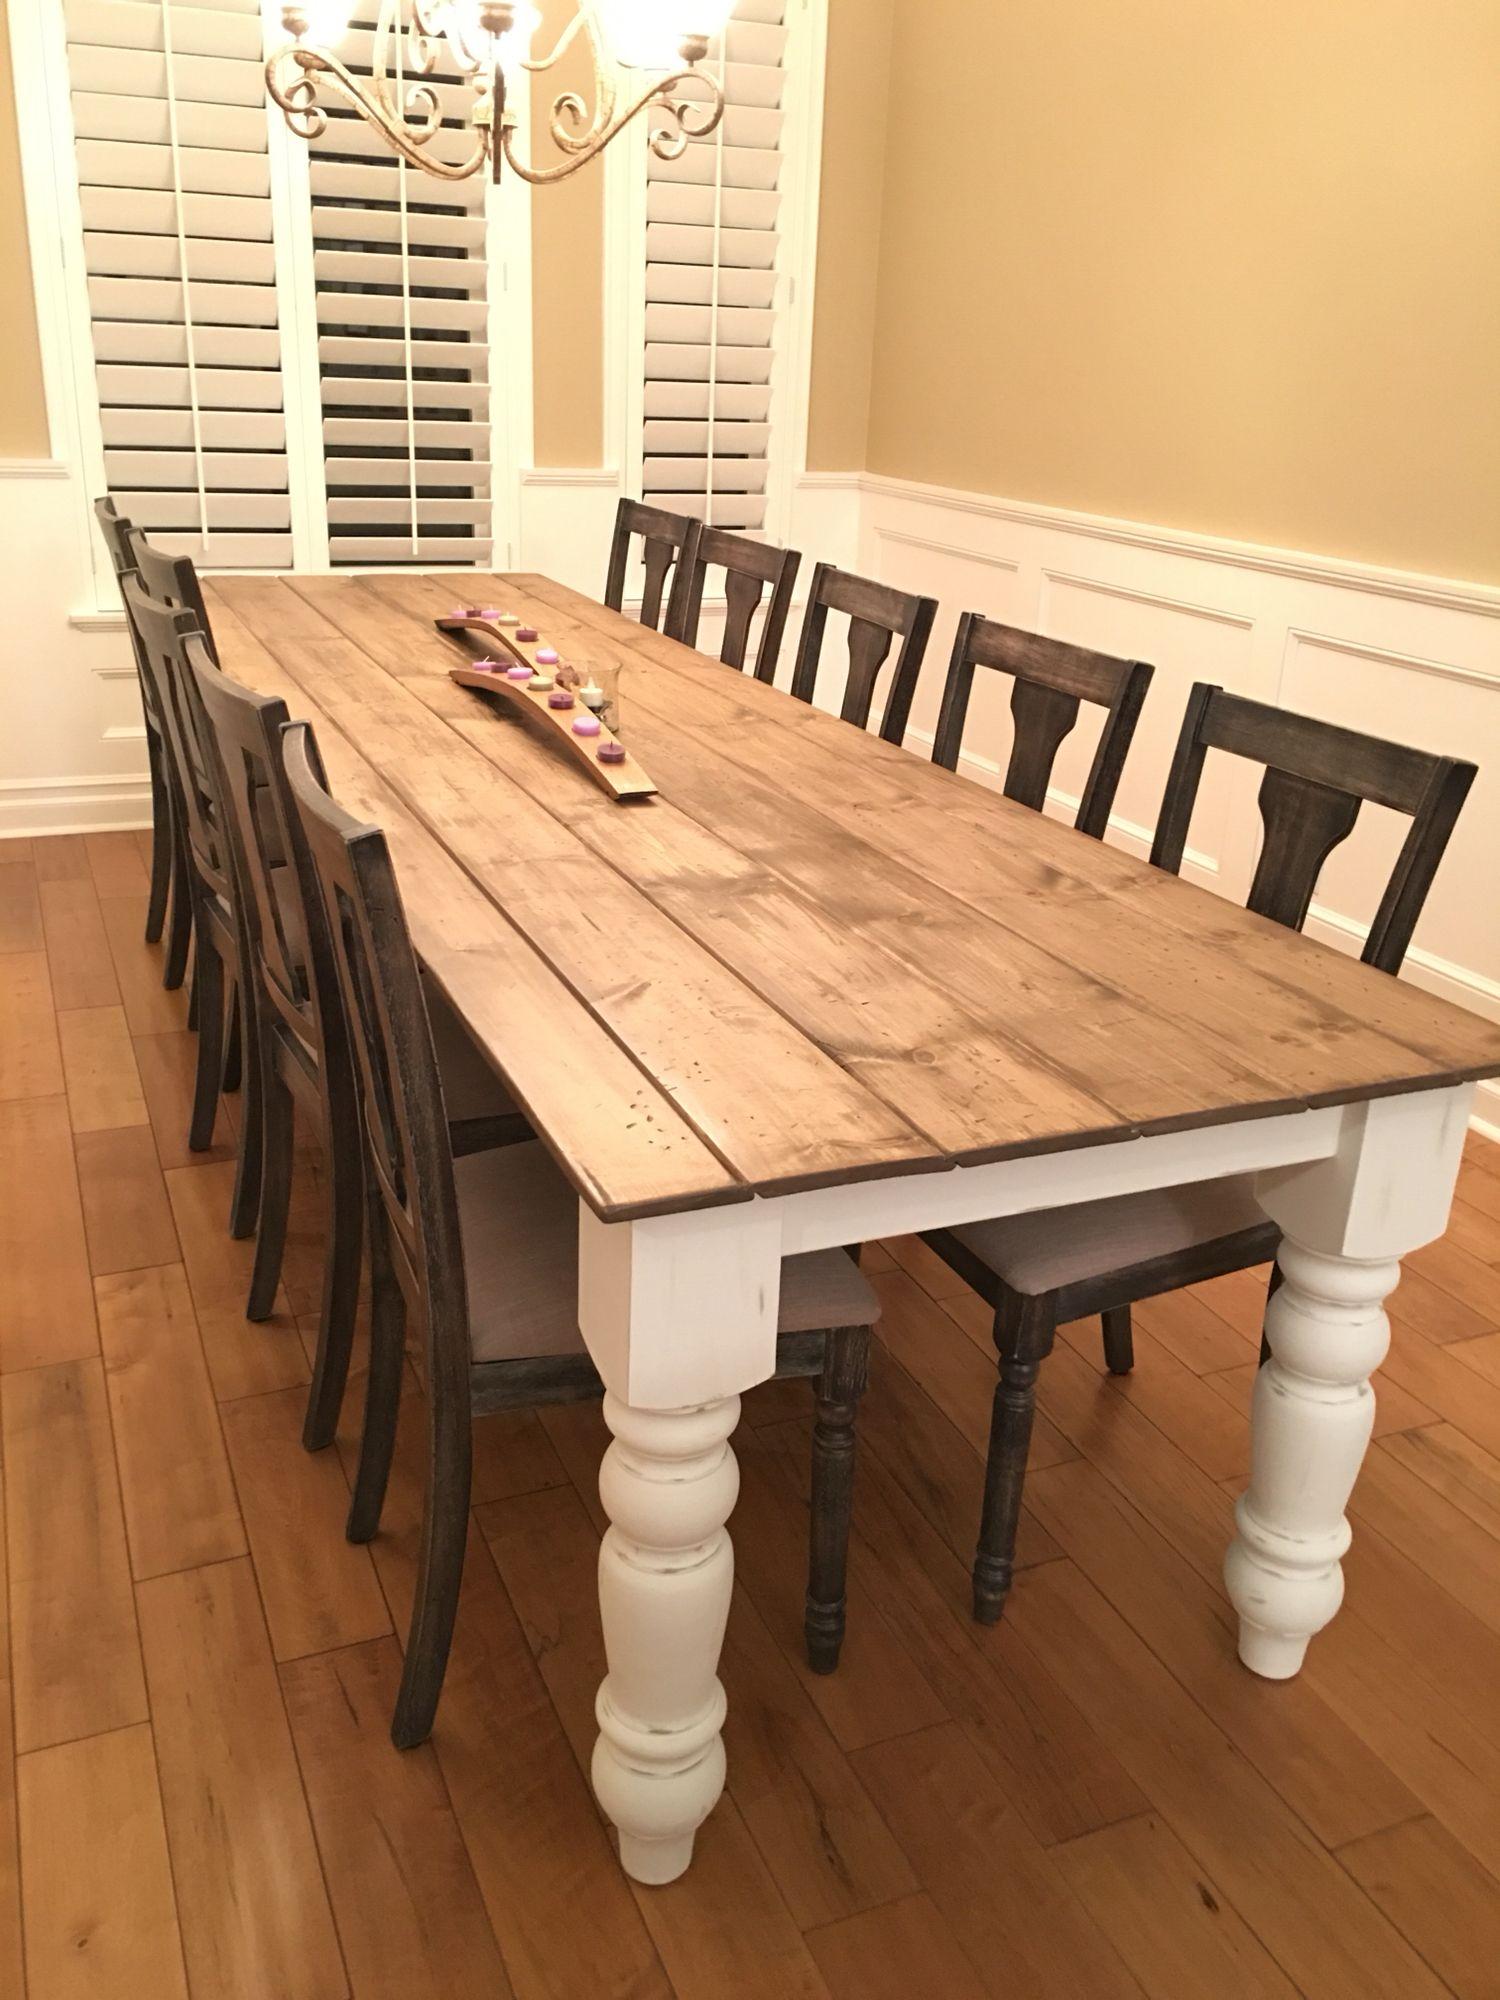 DIY FARMHOUSE TABLE. My husband made my 10 foot 8 inch